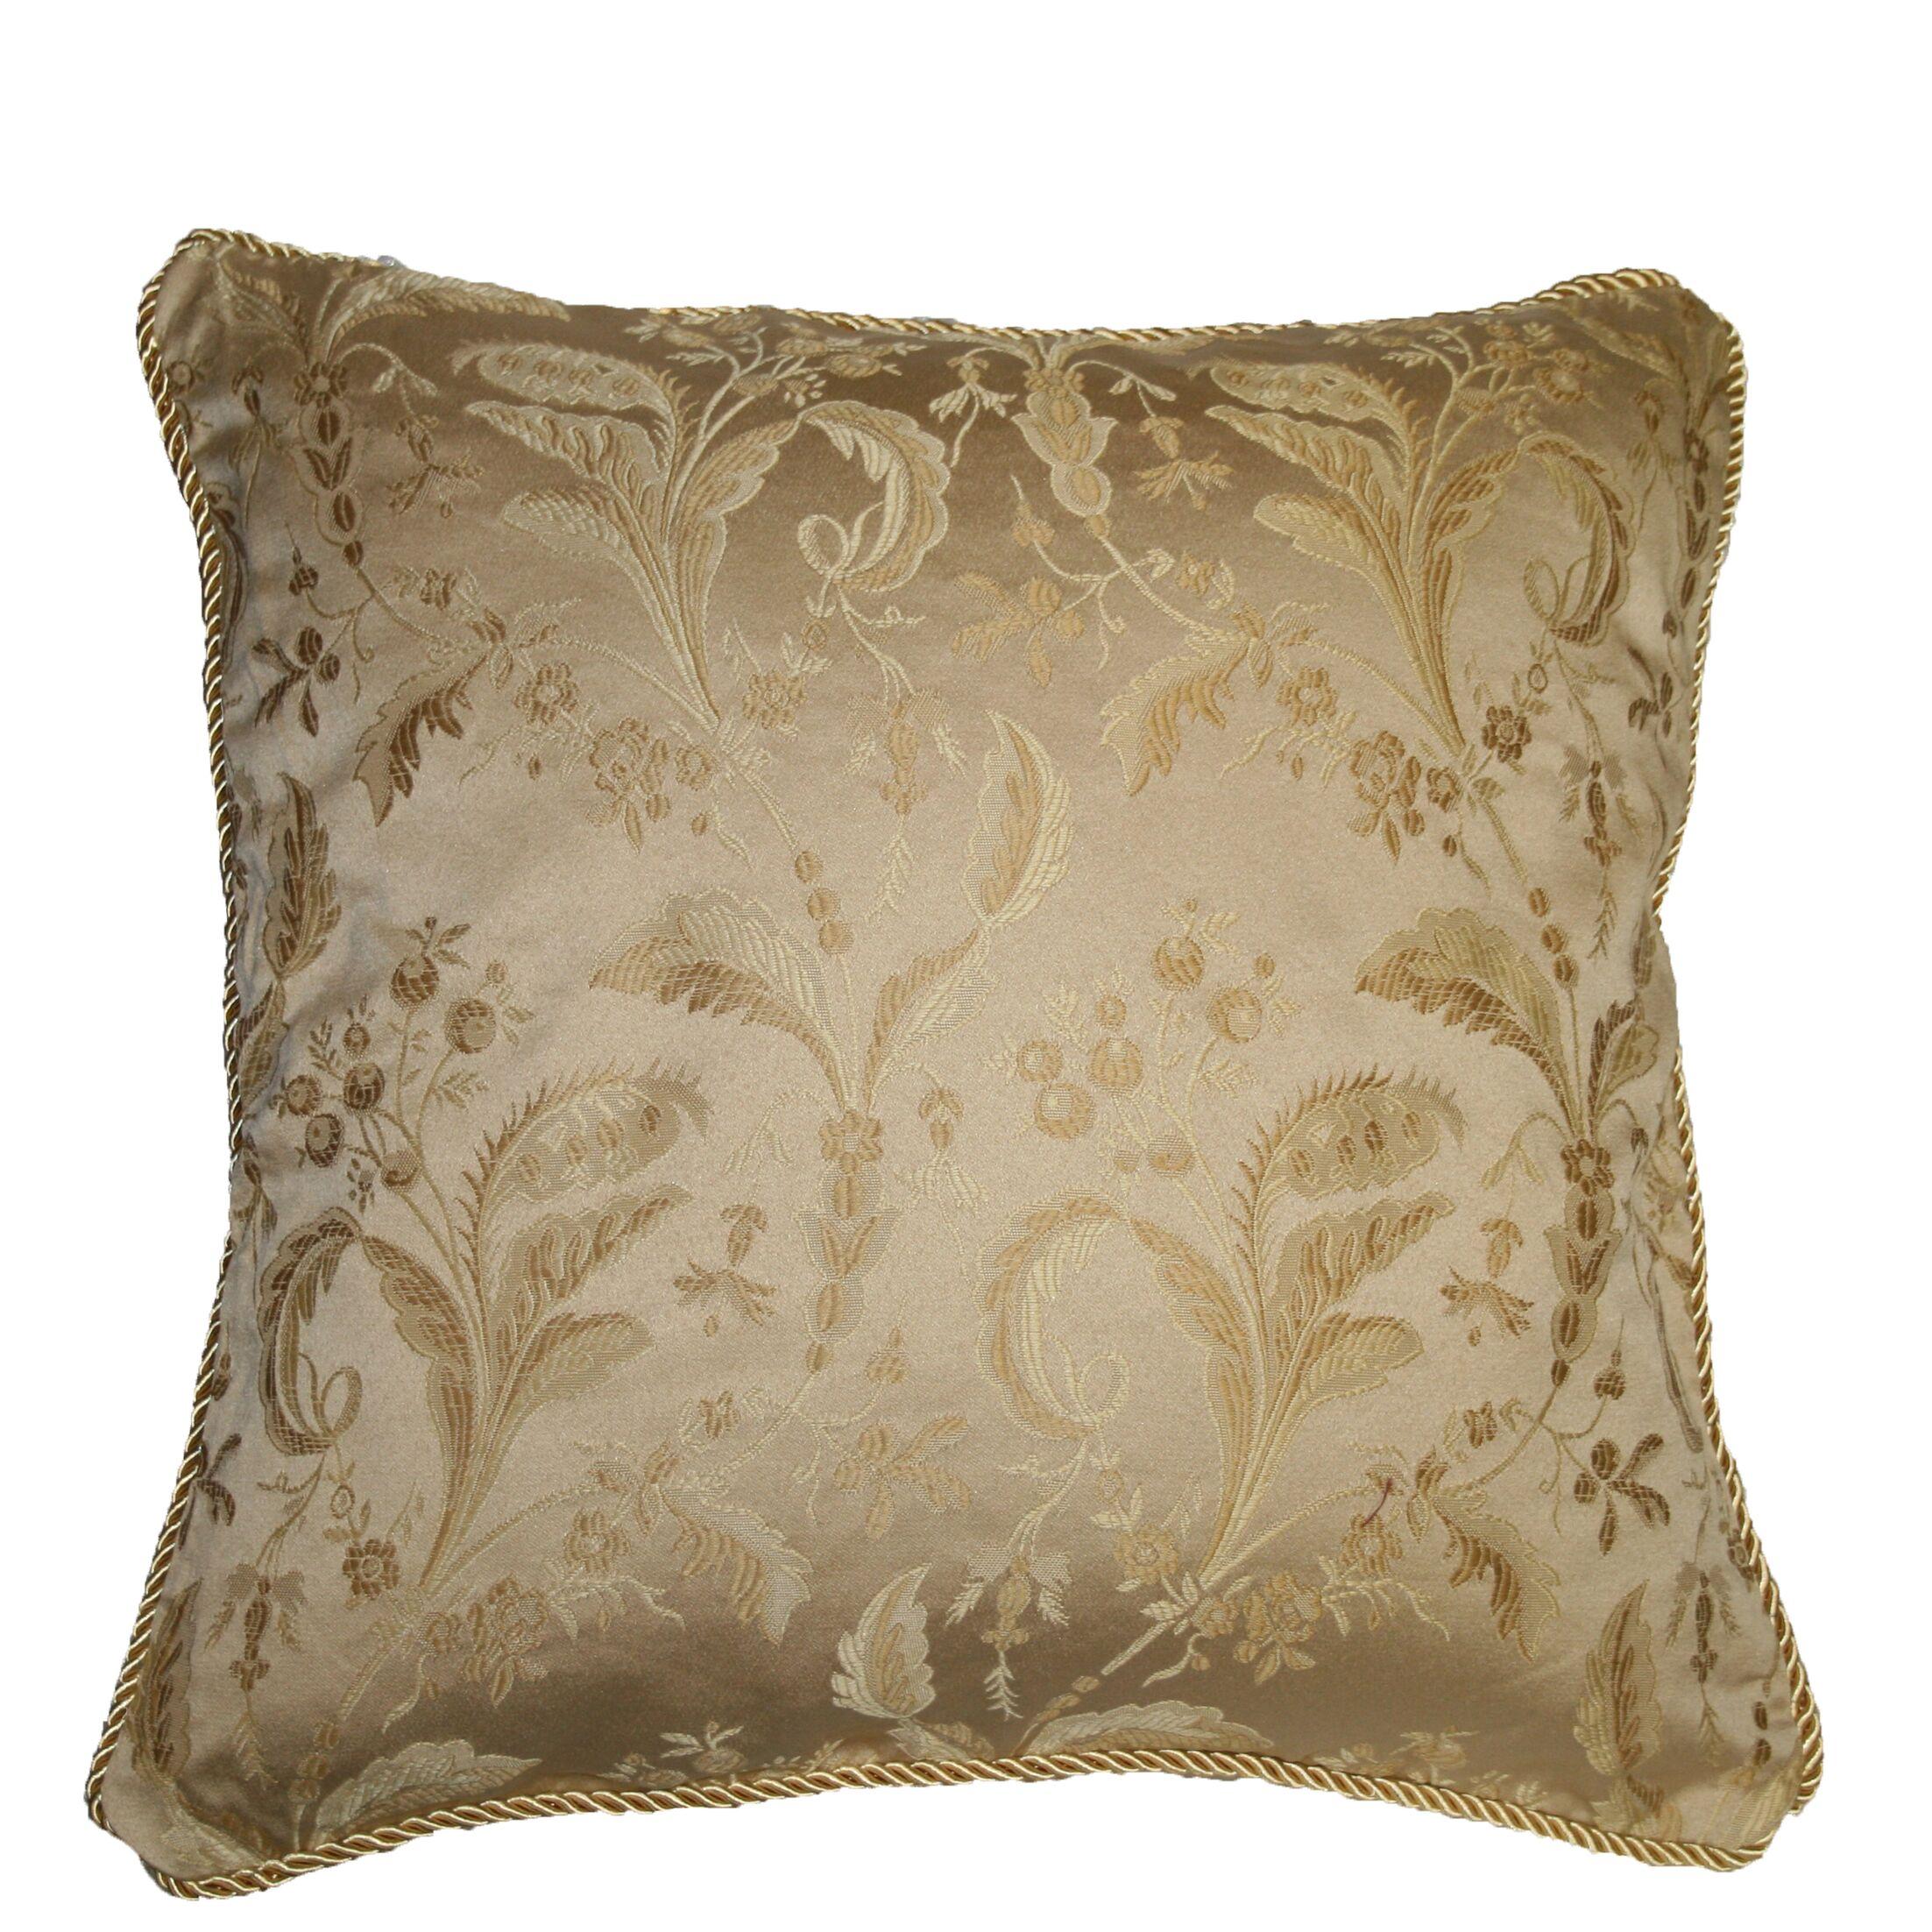 Rockport Design Decorative Pillow Cover Color: Gold